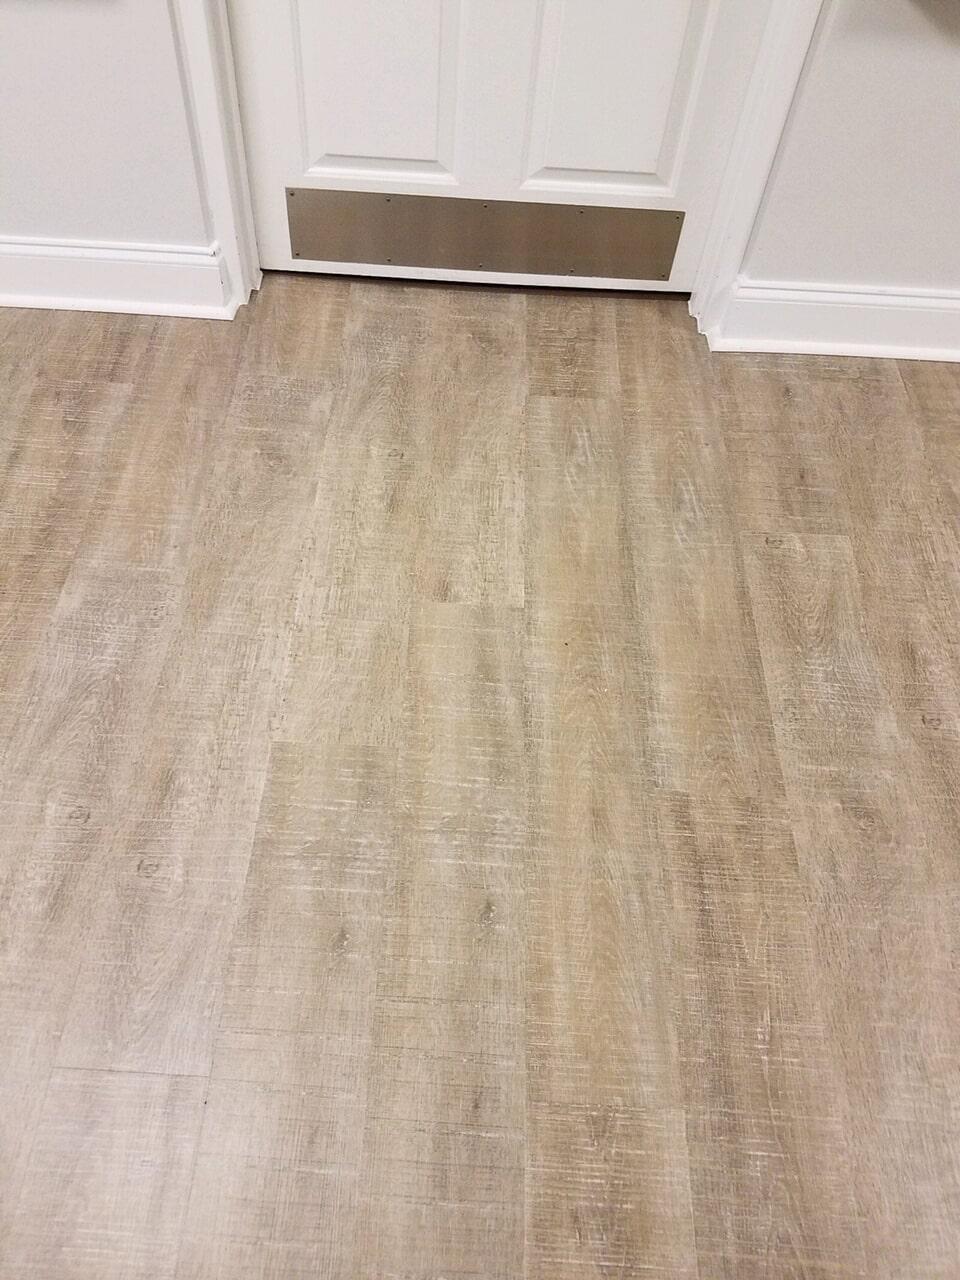 Hardwood flooring from The Flooring Center in Longwood, FL